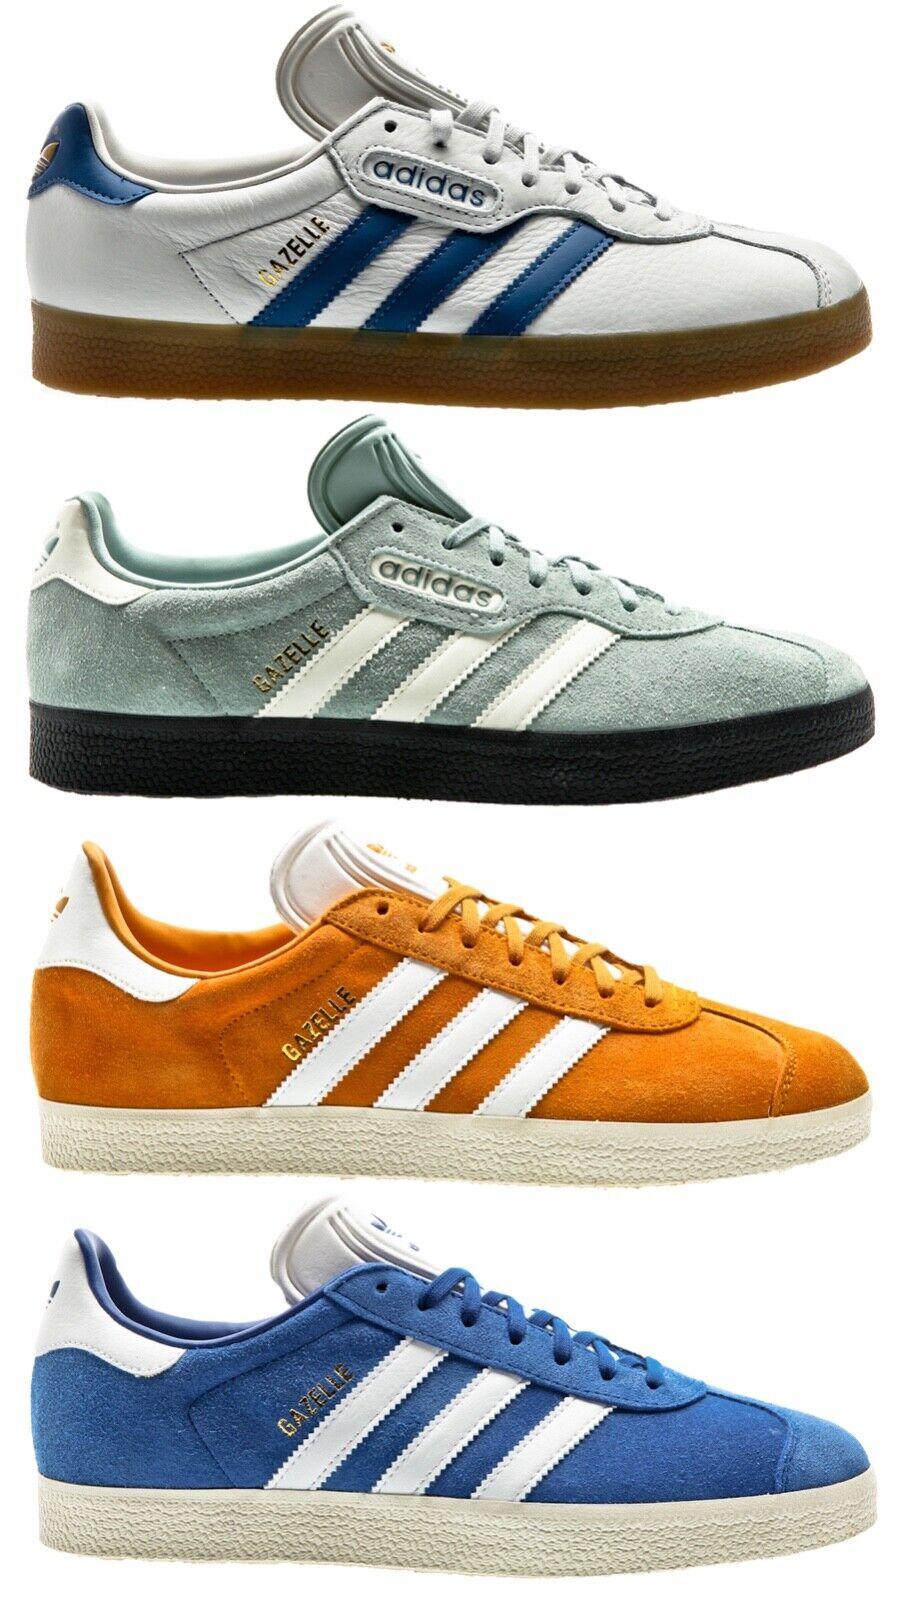 adidas Originals Gazelle Men Turnschuhe Herren Schuhe schuhe Turnschuhe